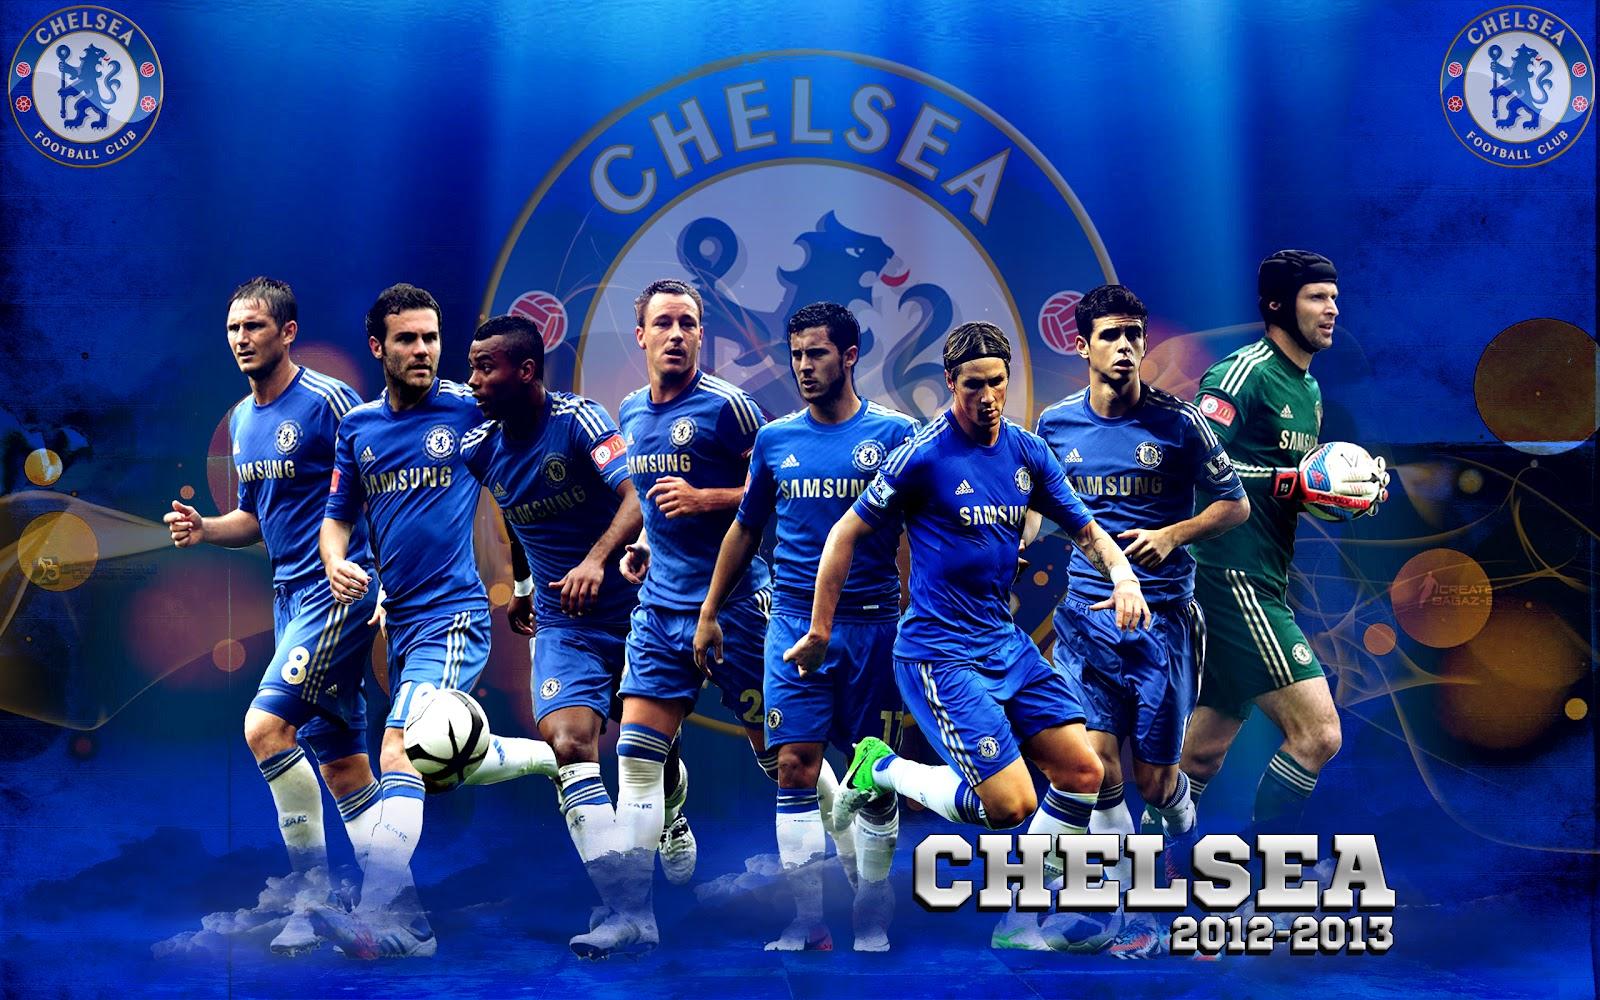 Chelsea wallpaper high resolution